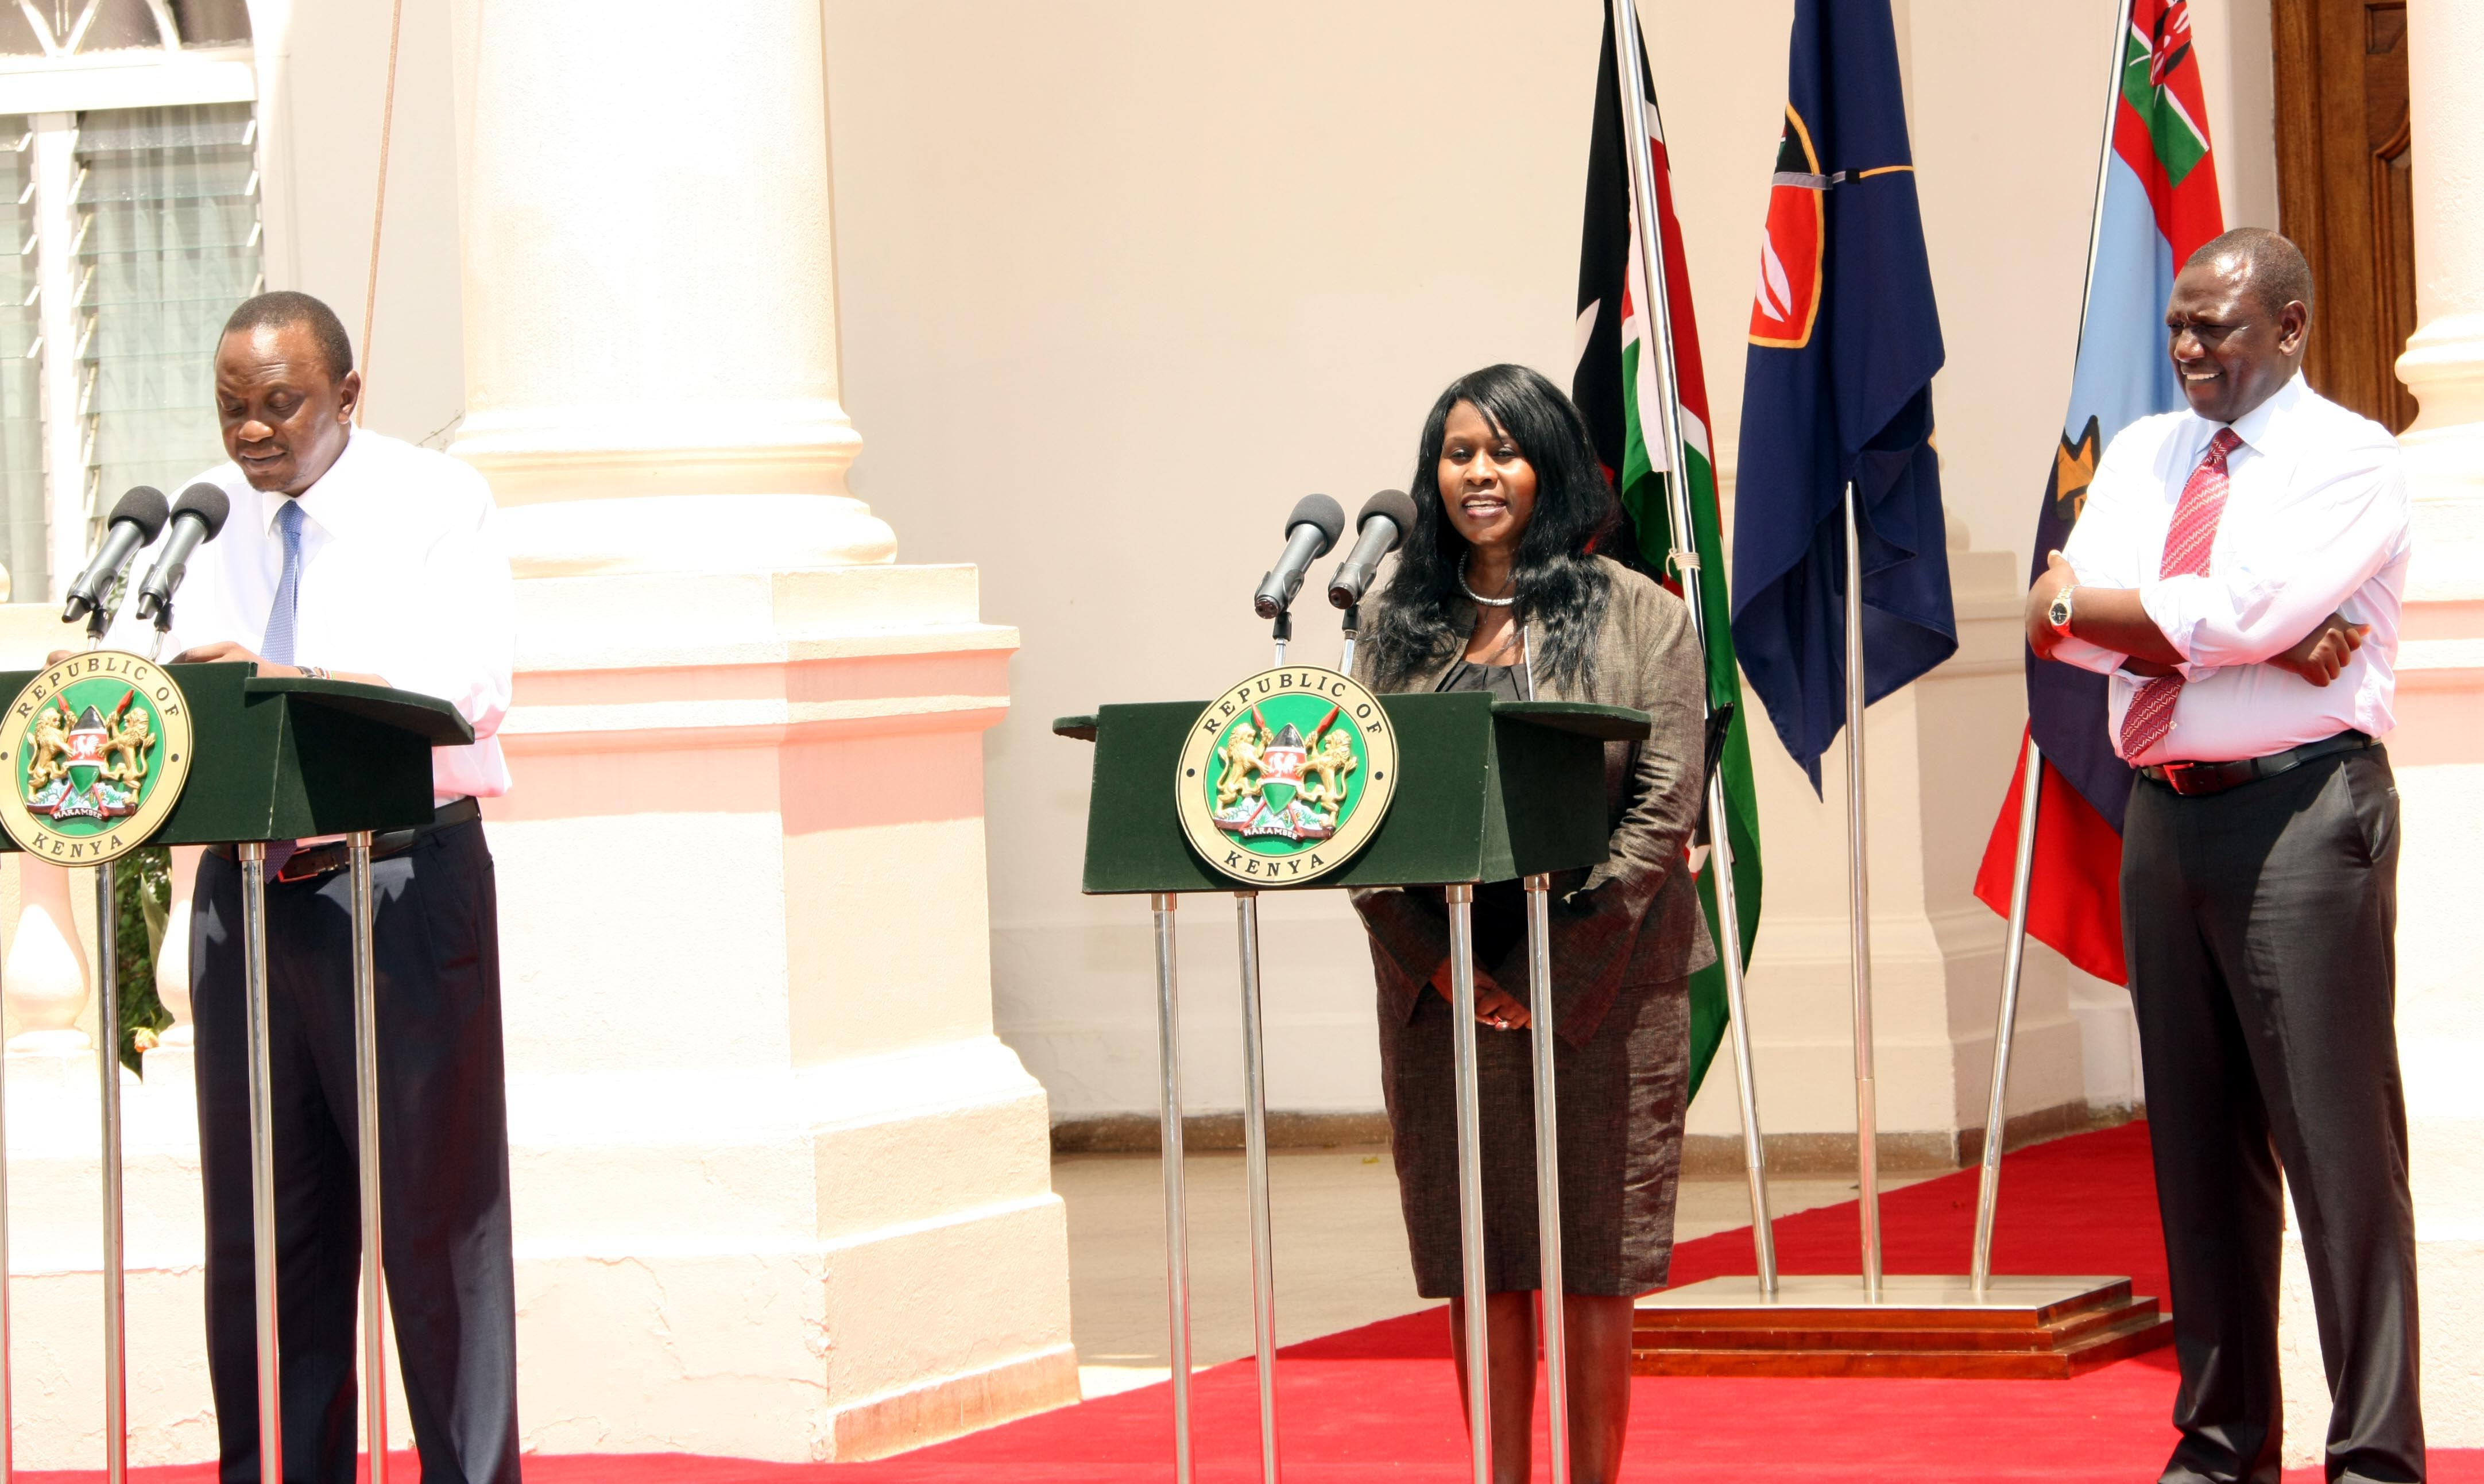 Kenyan Cabinet Secretaries President Uhuru Kenyatta Introduces Prof Judi Wangalwa Wakhungu